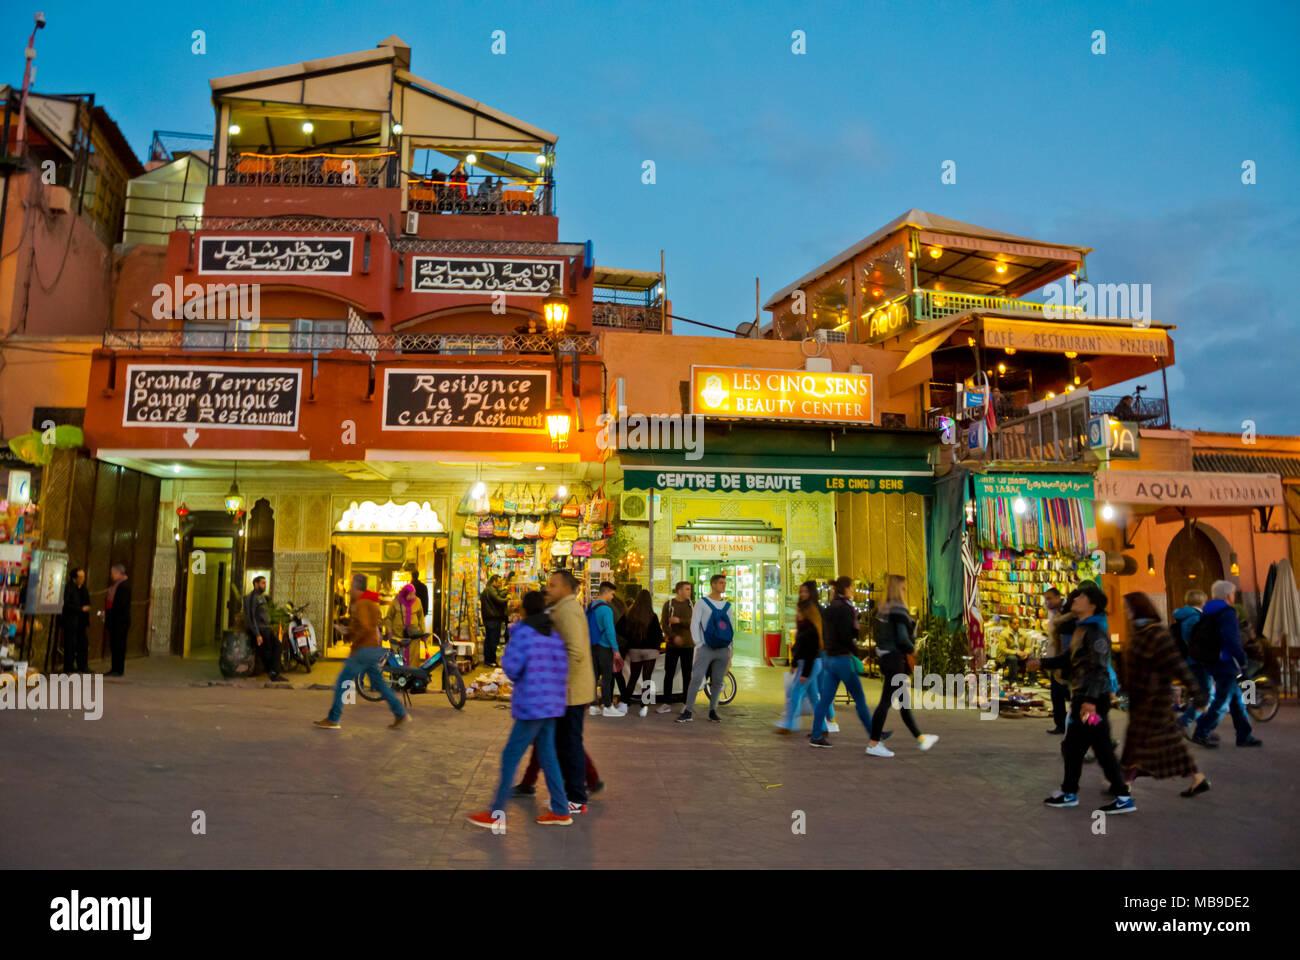 Jamaa el Fna, Marrakesh, Morocco, northern Africa Stock Photo